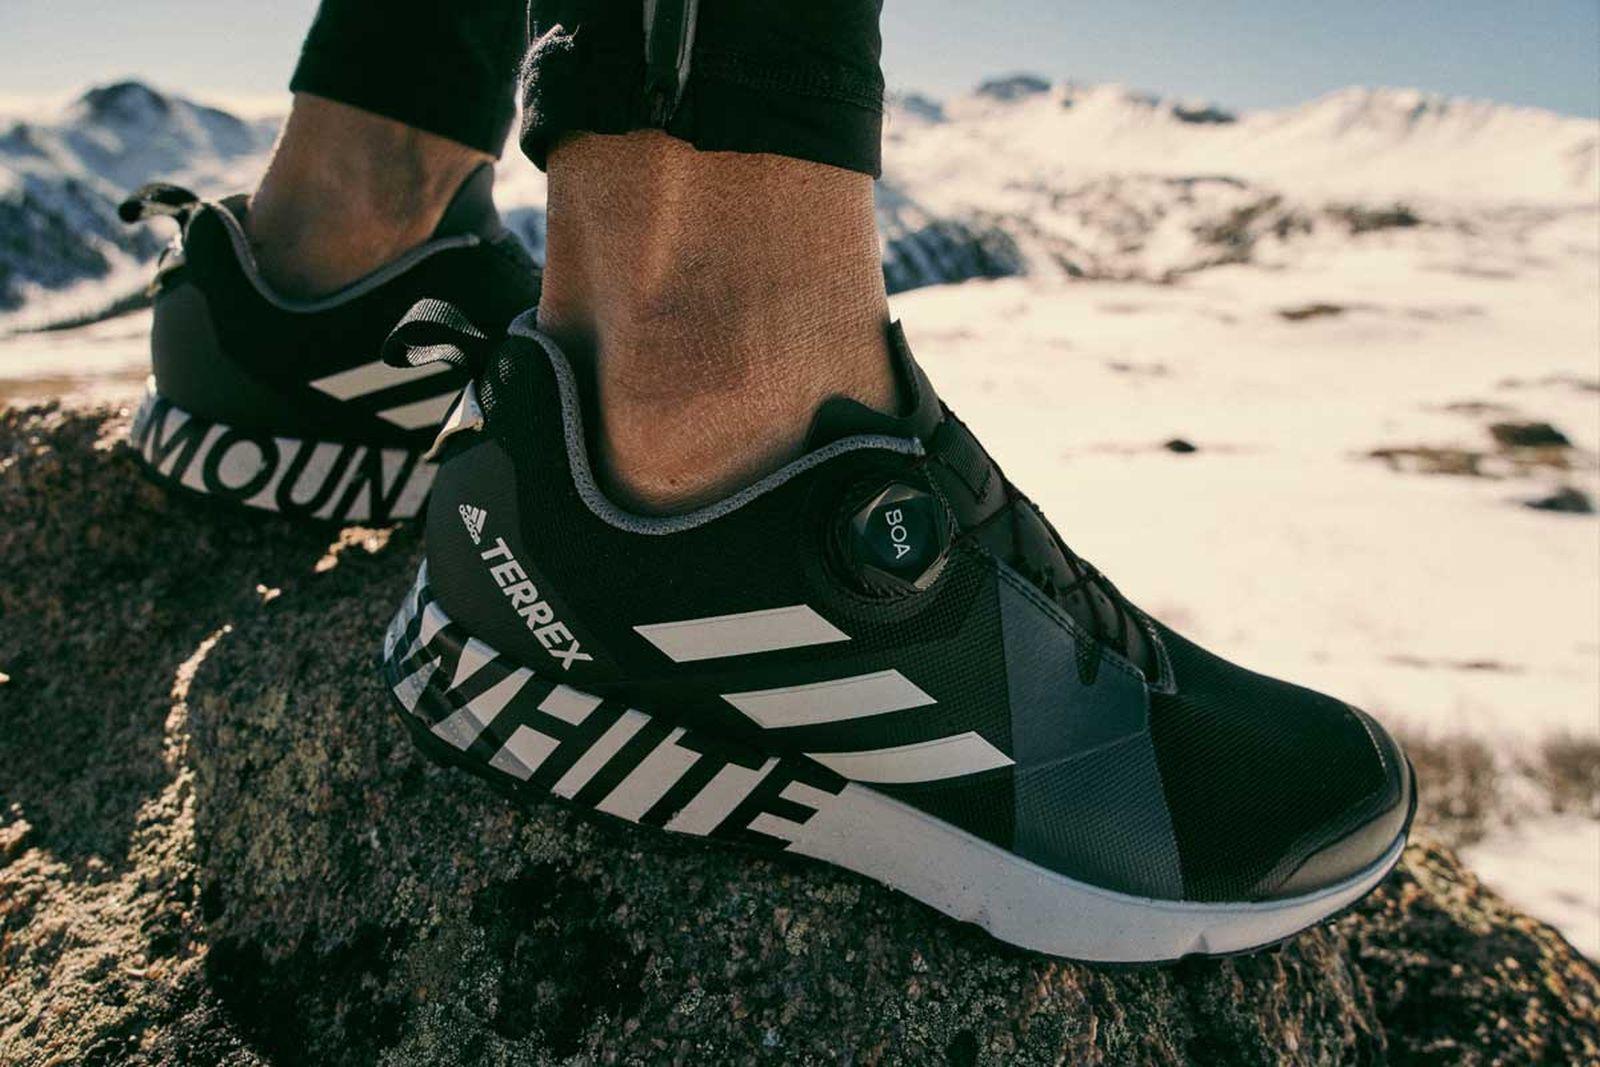 Entrelazamiento contar Marco de referencia  Here's How to Cop White Mountaineering's adidas Terrex Two Boa